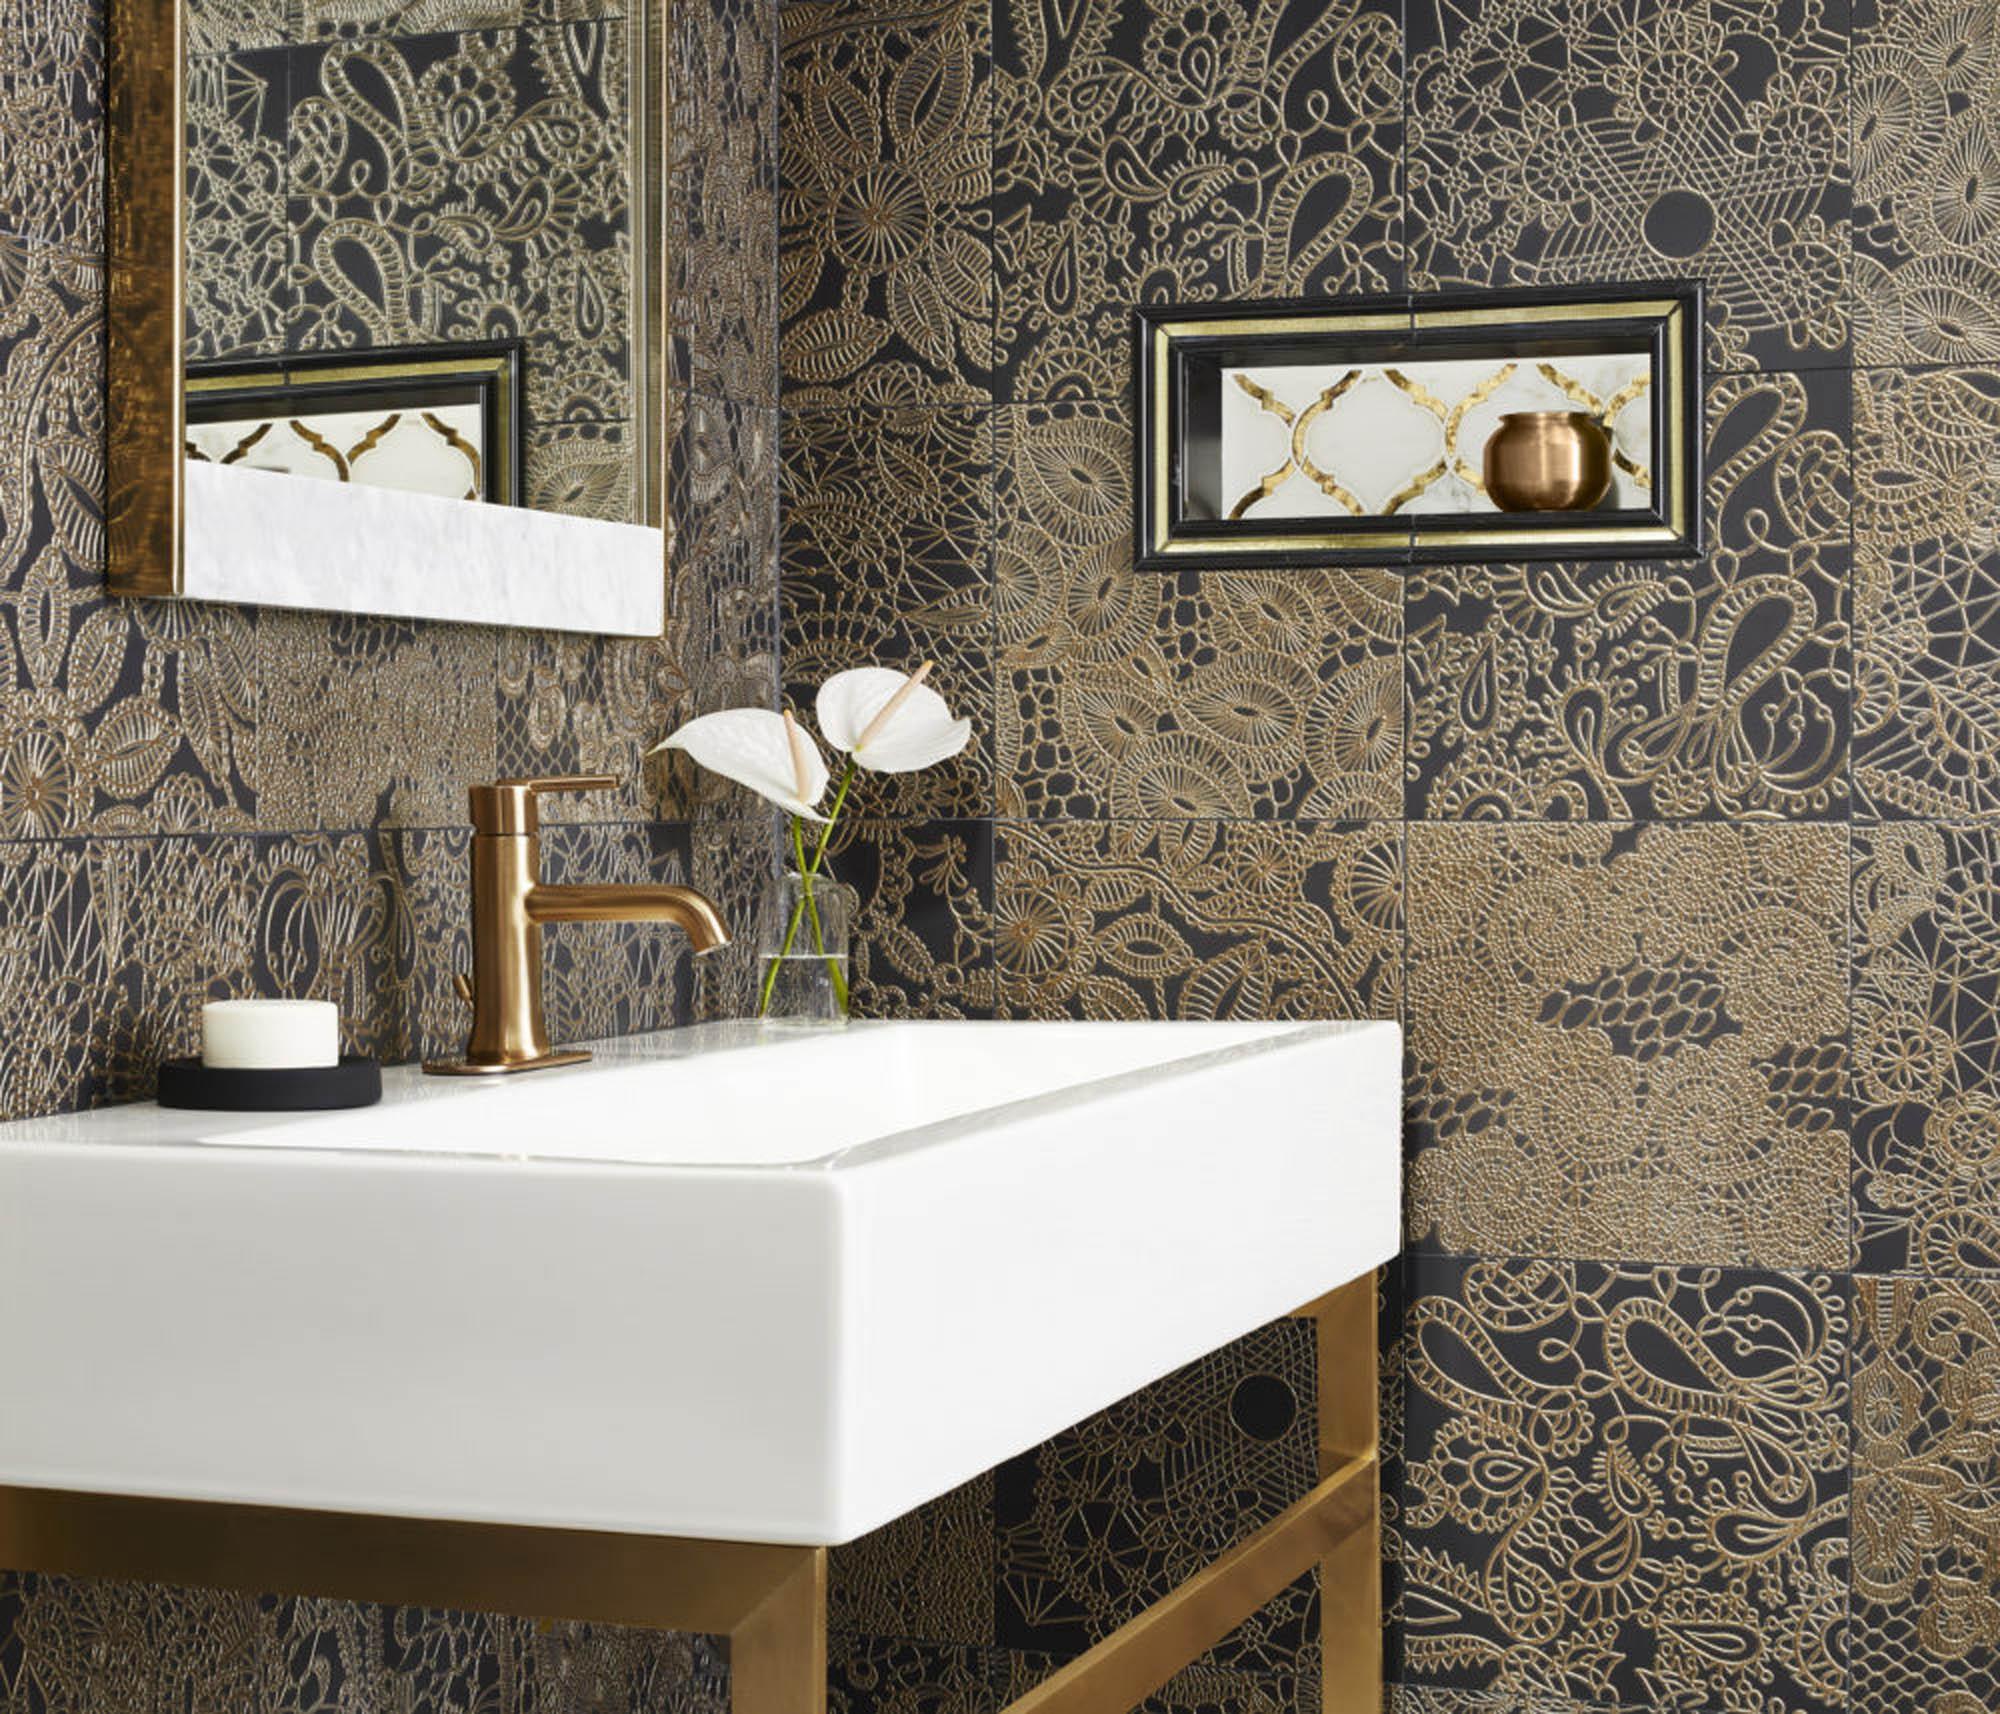 Multifired gold and black bathroom tile